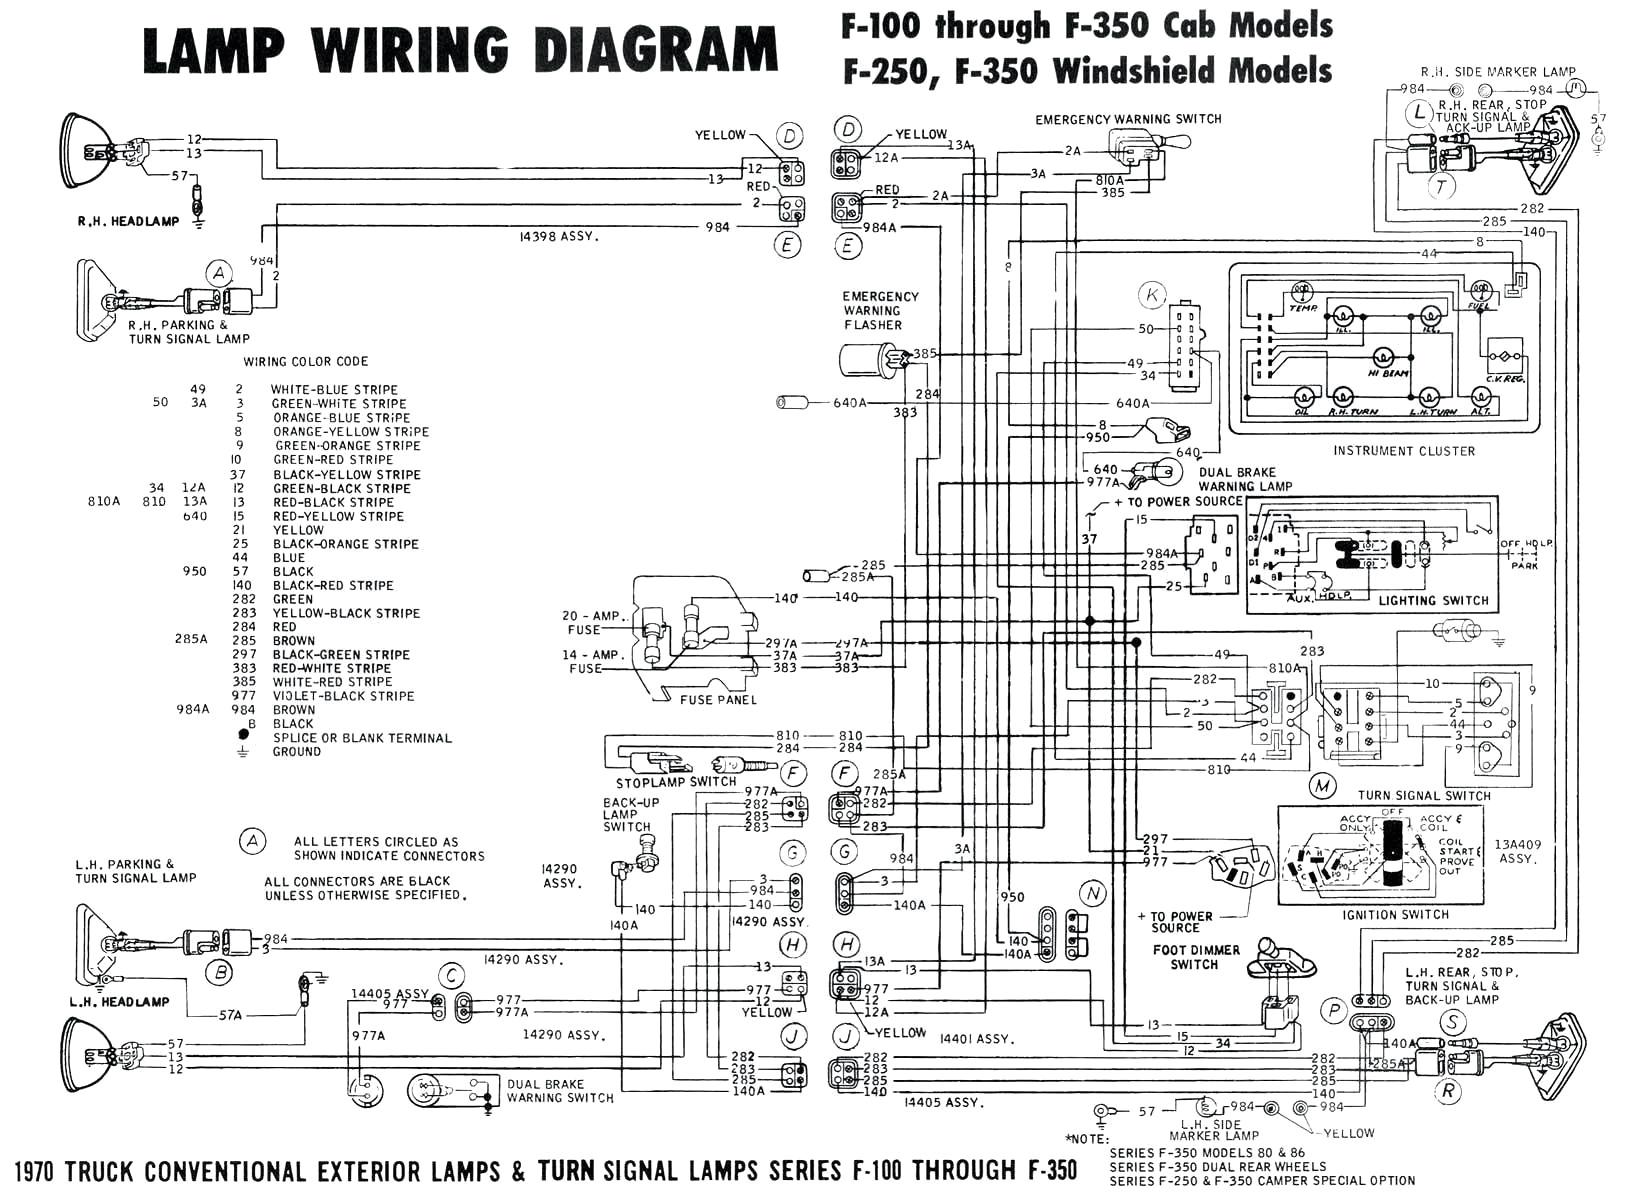 asco ats wiring diagram data schematic diagram 8221g011 asco wiring diagram